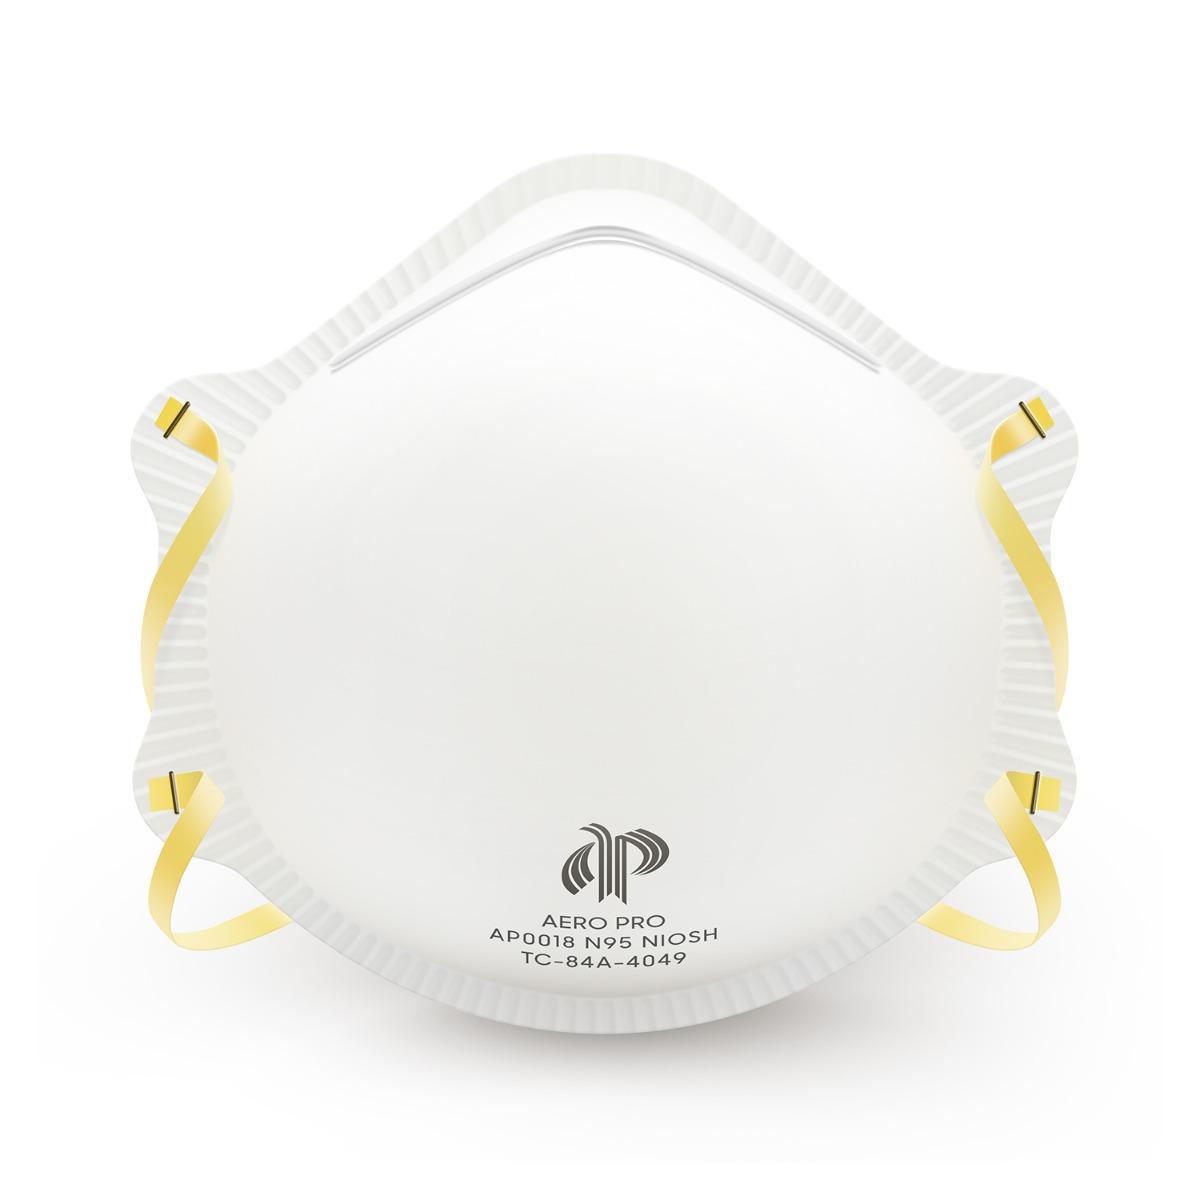 90-Pack N95 Respirator (NIOSH), FDA 510K Cleared Surgical Respirator Mask, Medical Grade Disposable Particulate Filtering Respirator (90 Count)